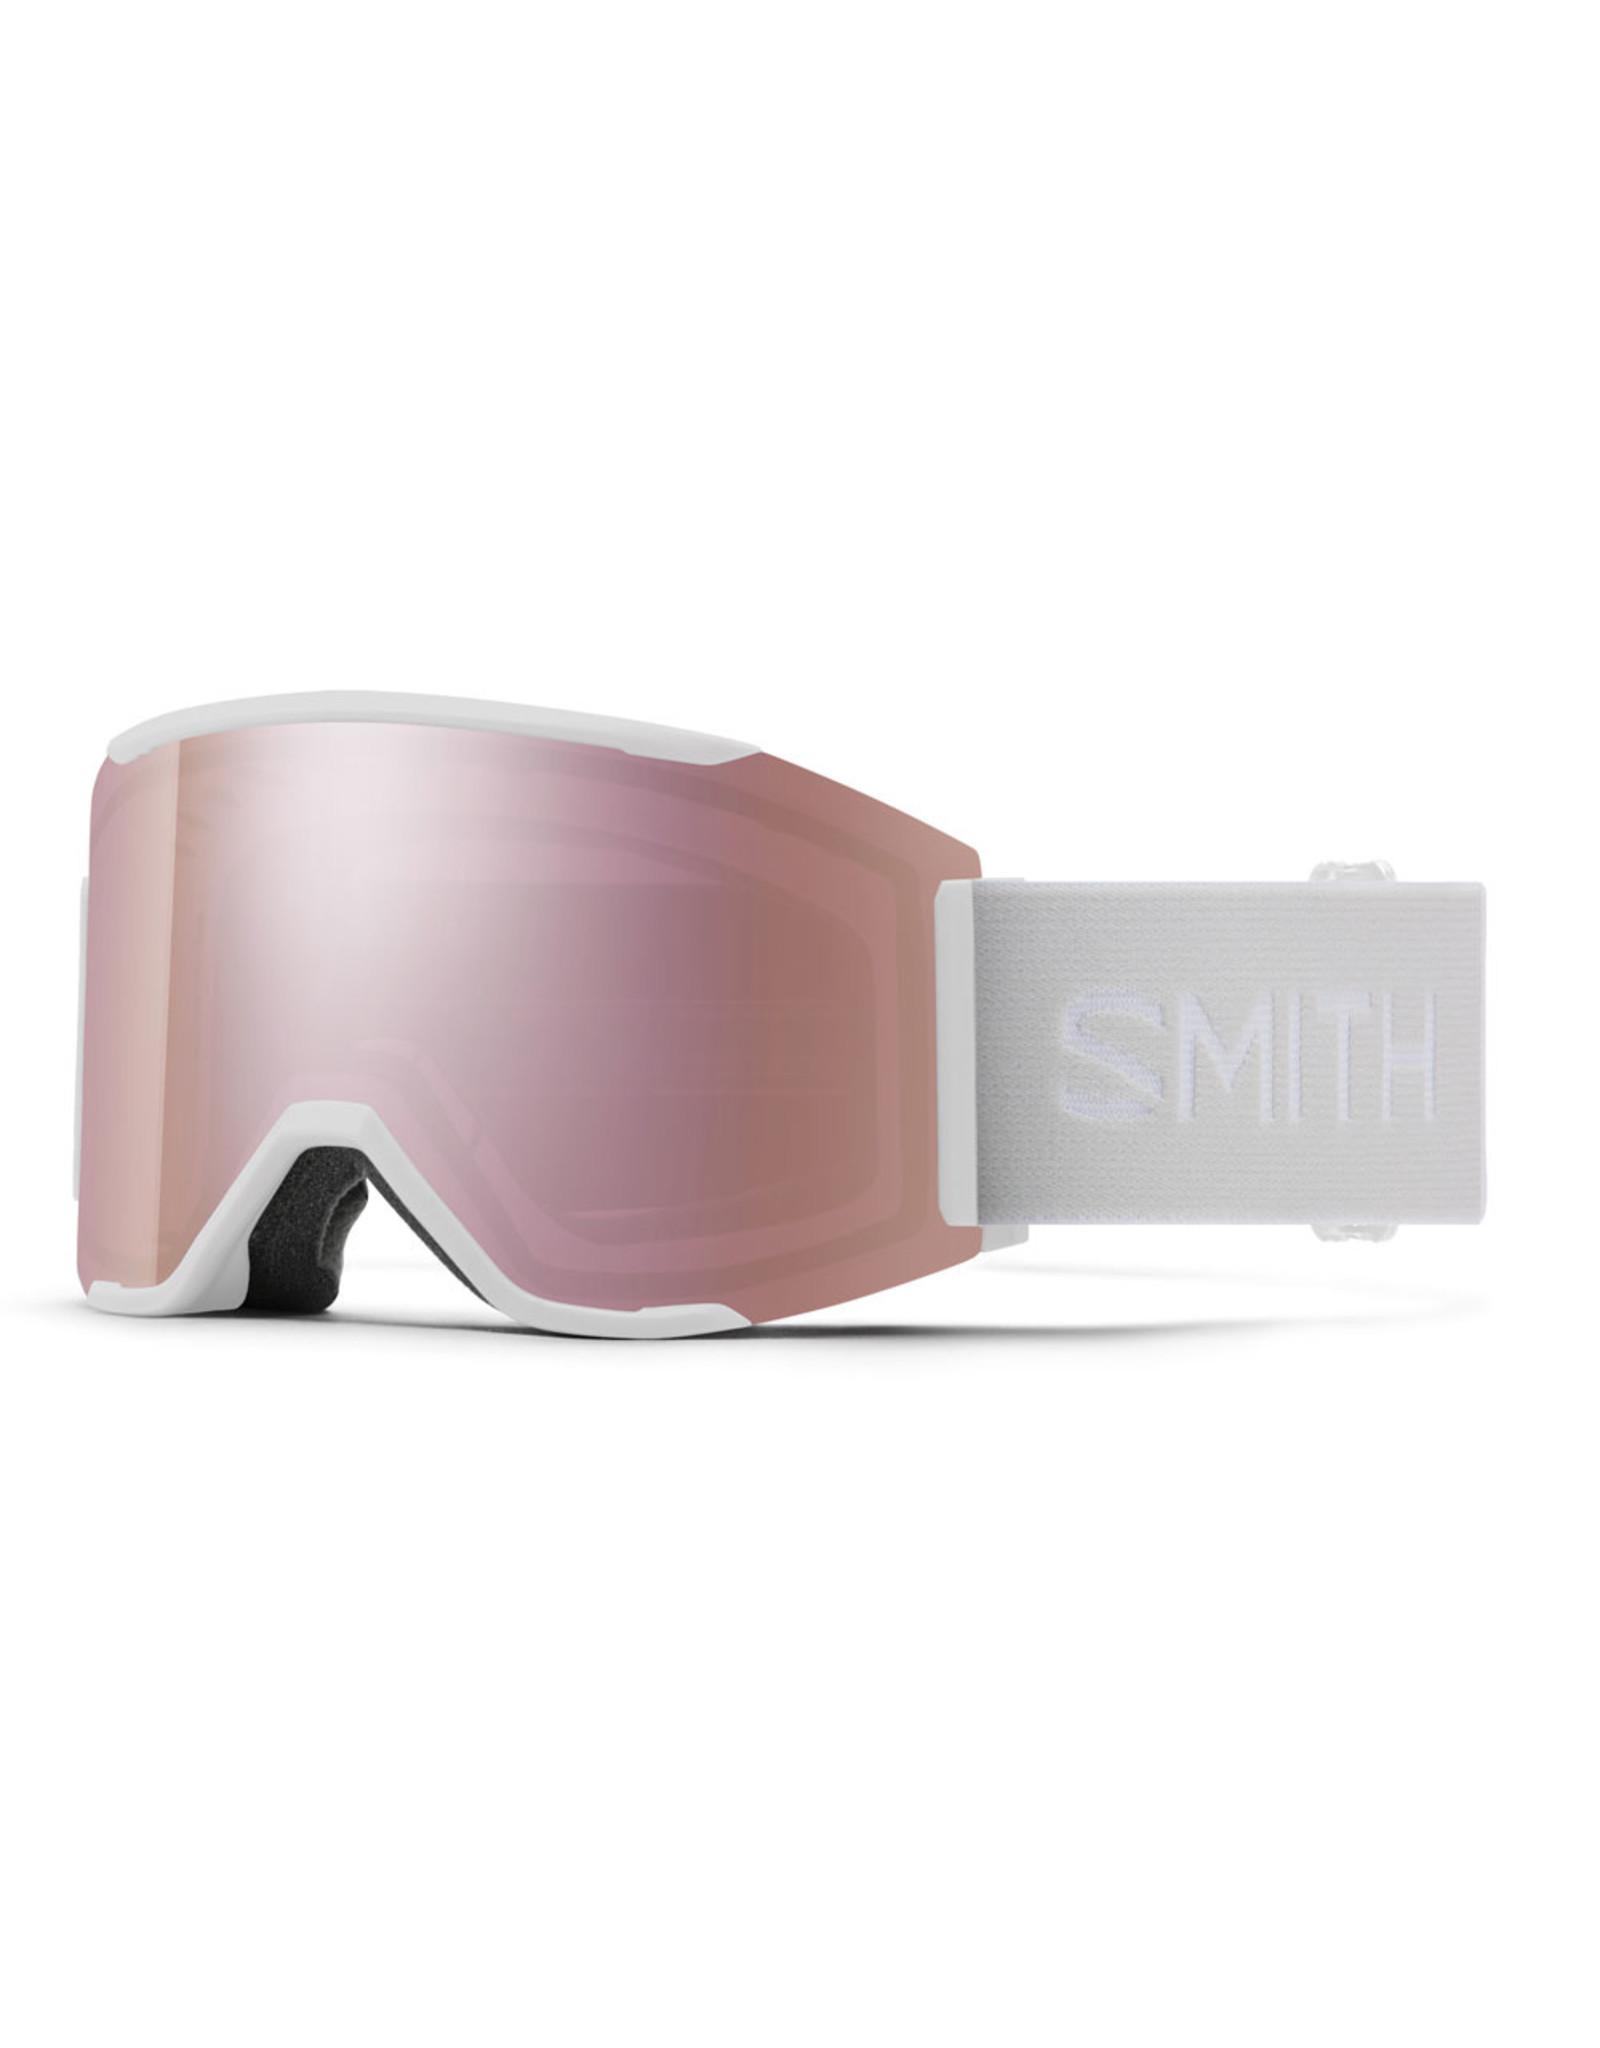 SMITH SQUAD MAG WHITE VAPOR ROSE GOLD MIRROR